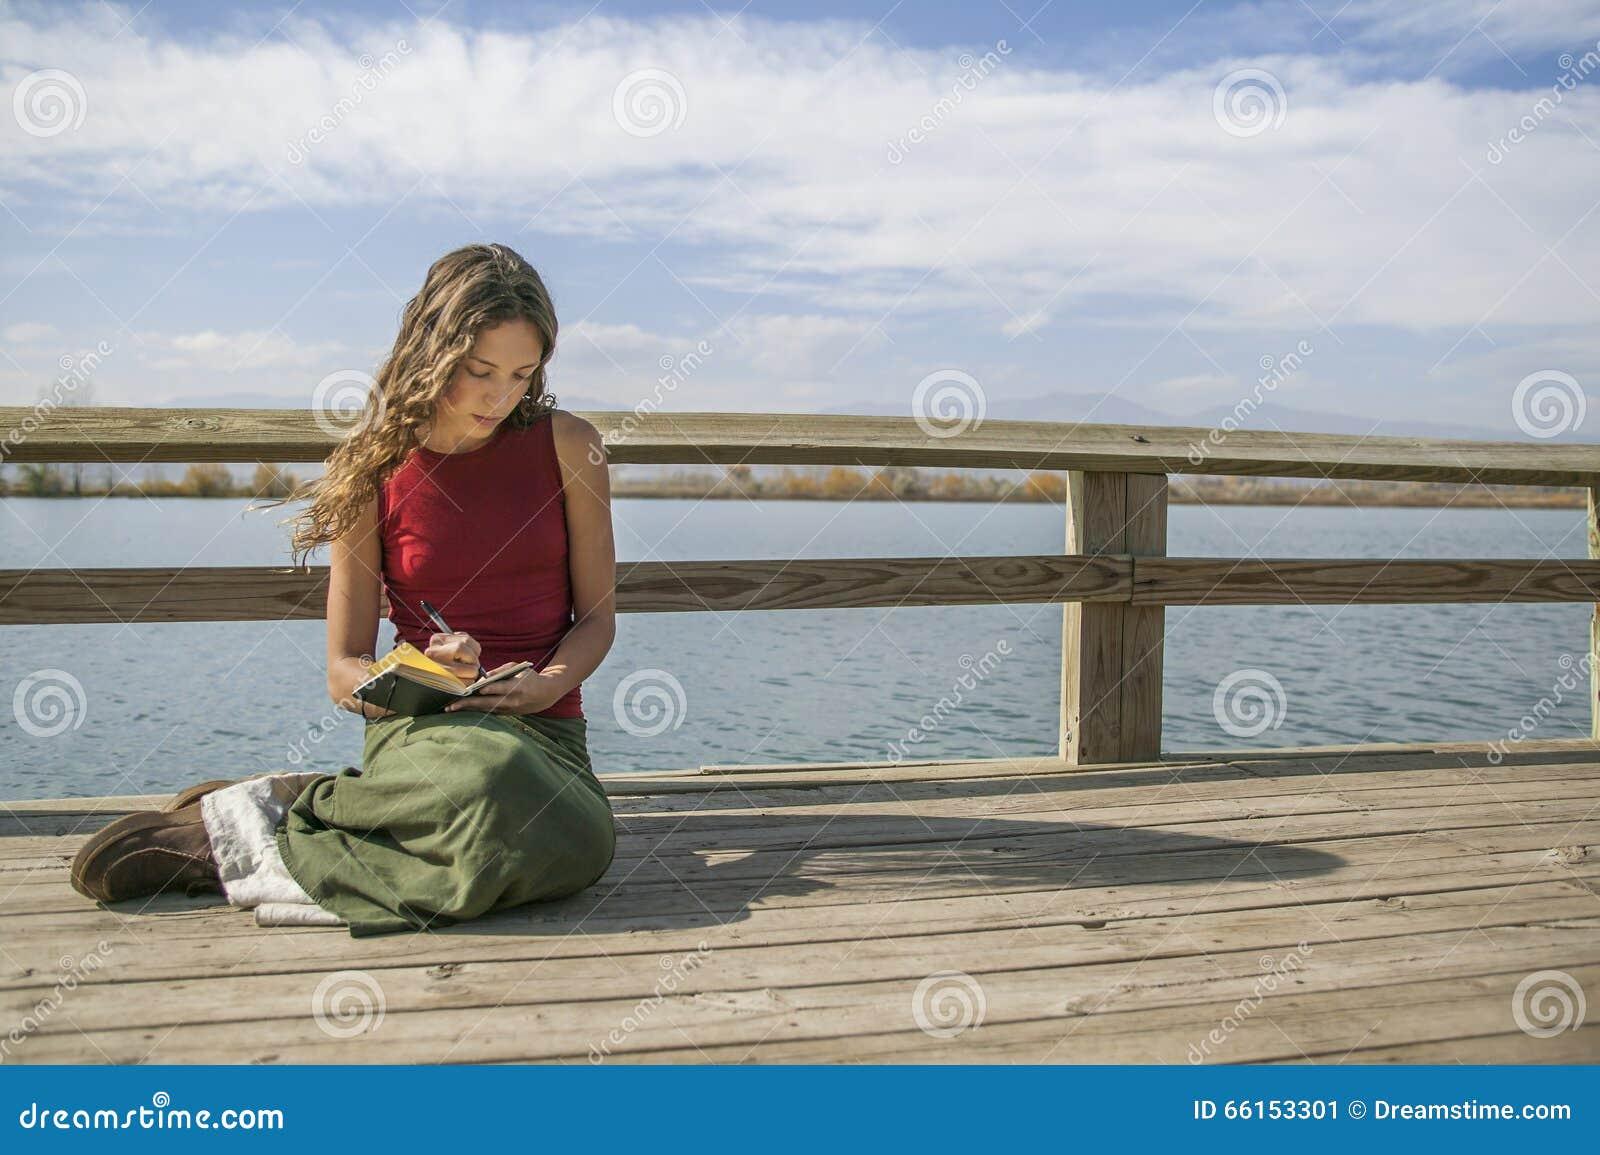 Escrita de cabelos compridos bonita da mulher no jornal perto do lago rural